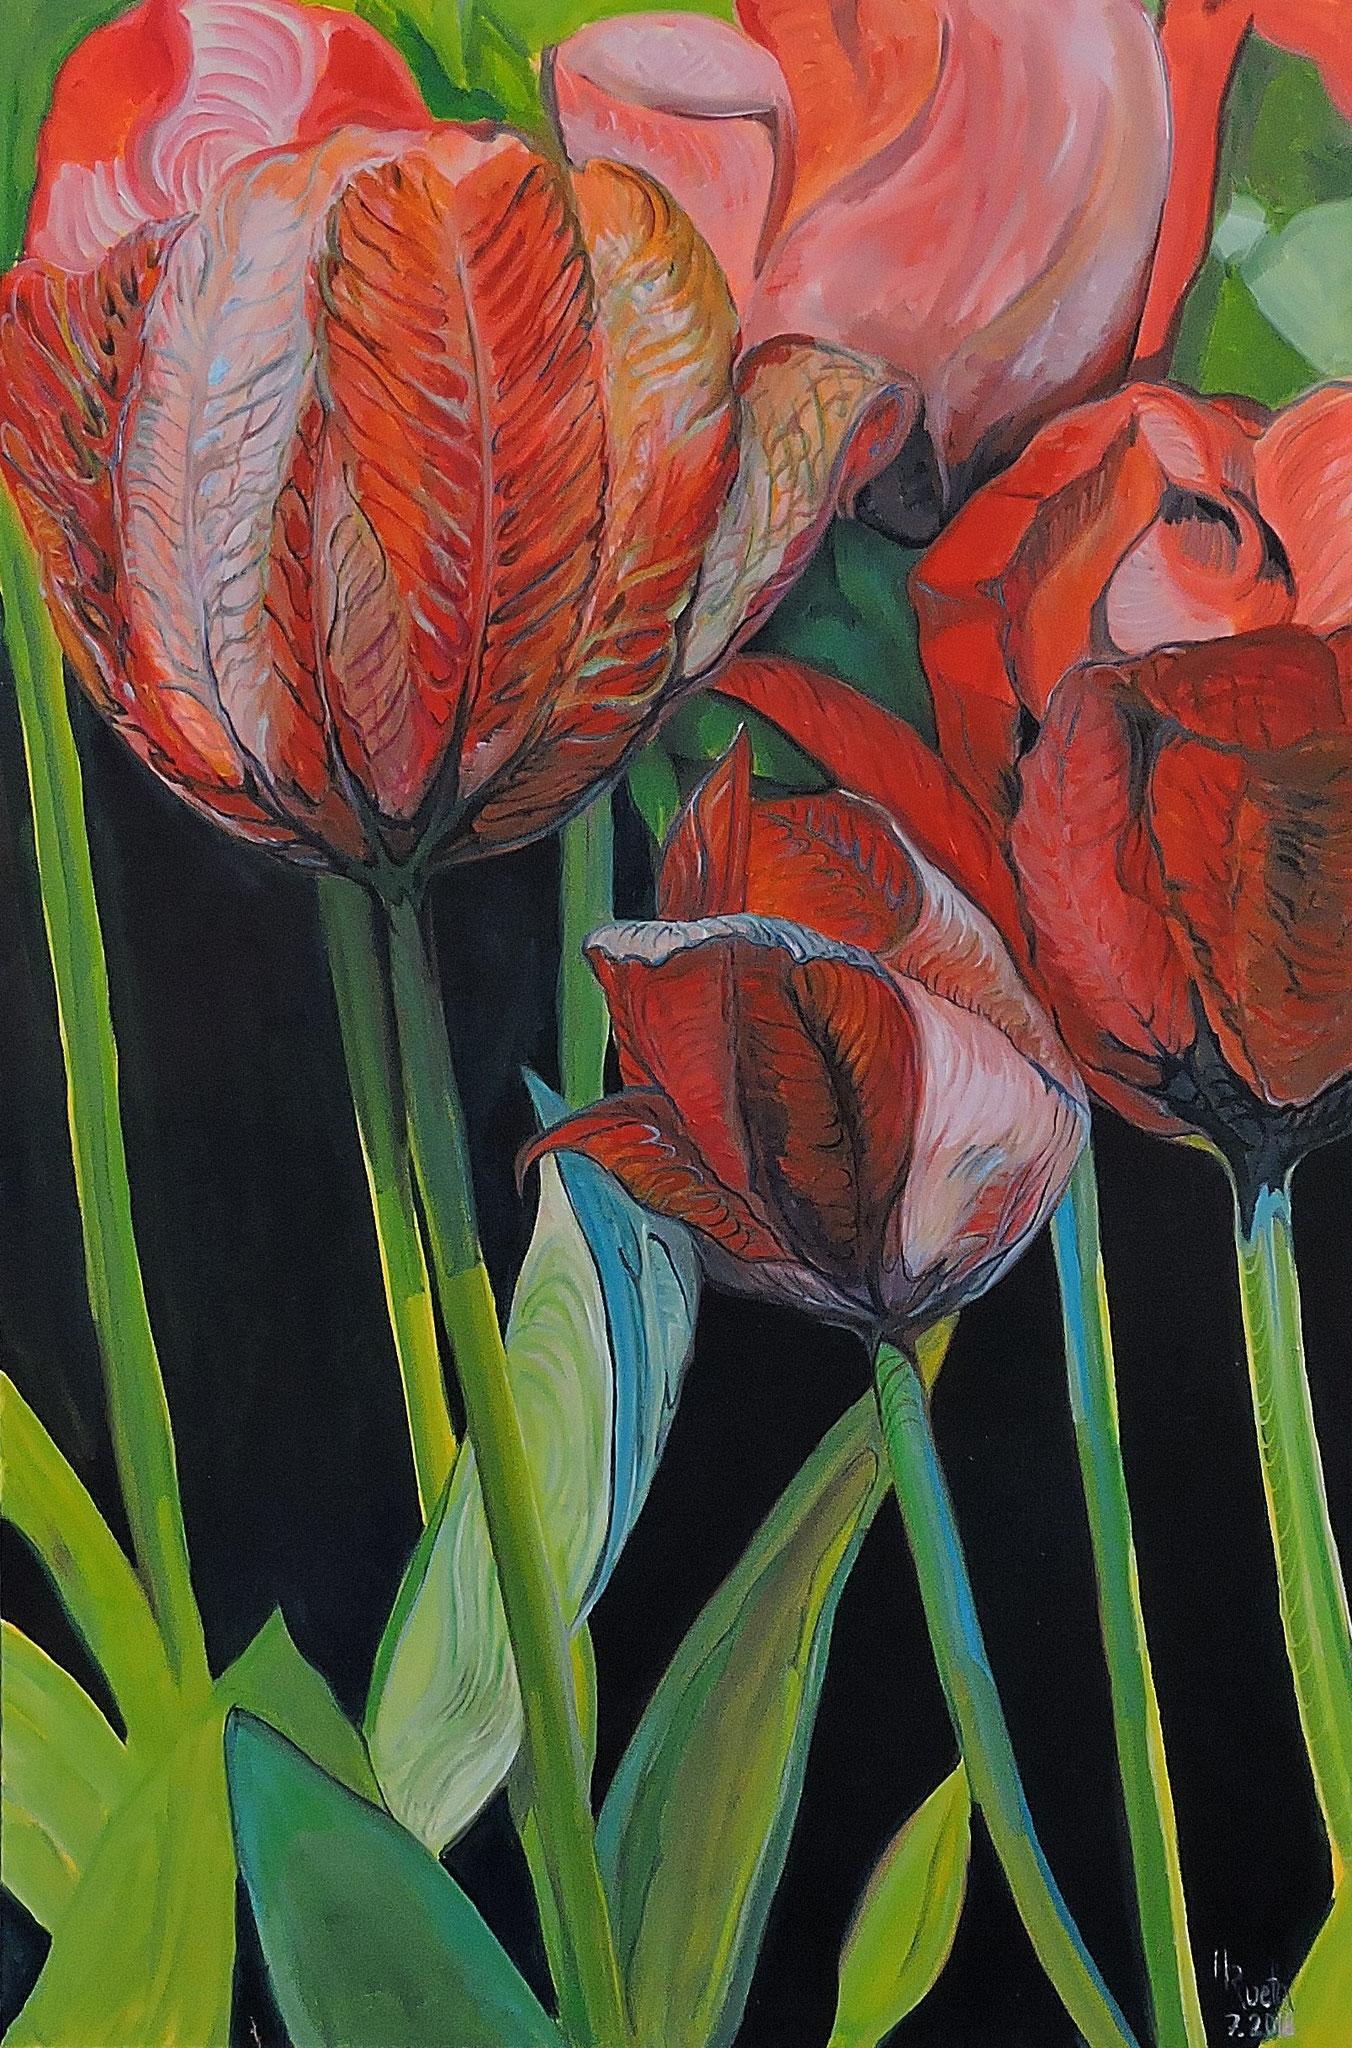 """Tulpen im Wind"", 100x150 cm, Öl auf Leinwand, 2018....................1850,- Euro"